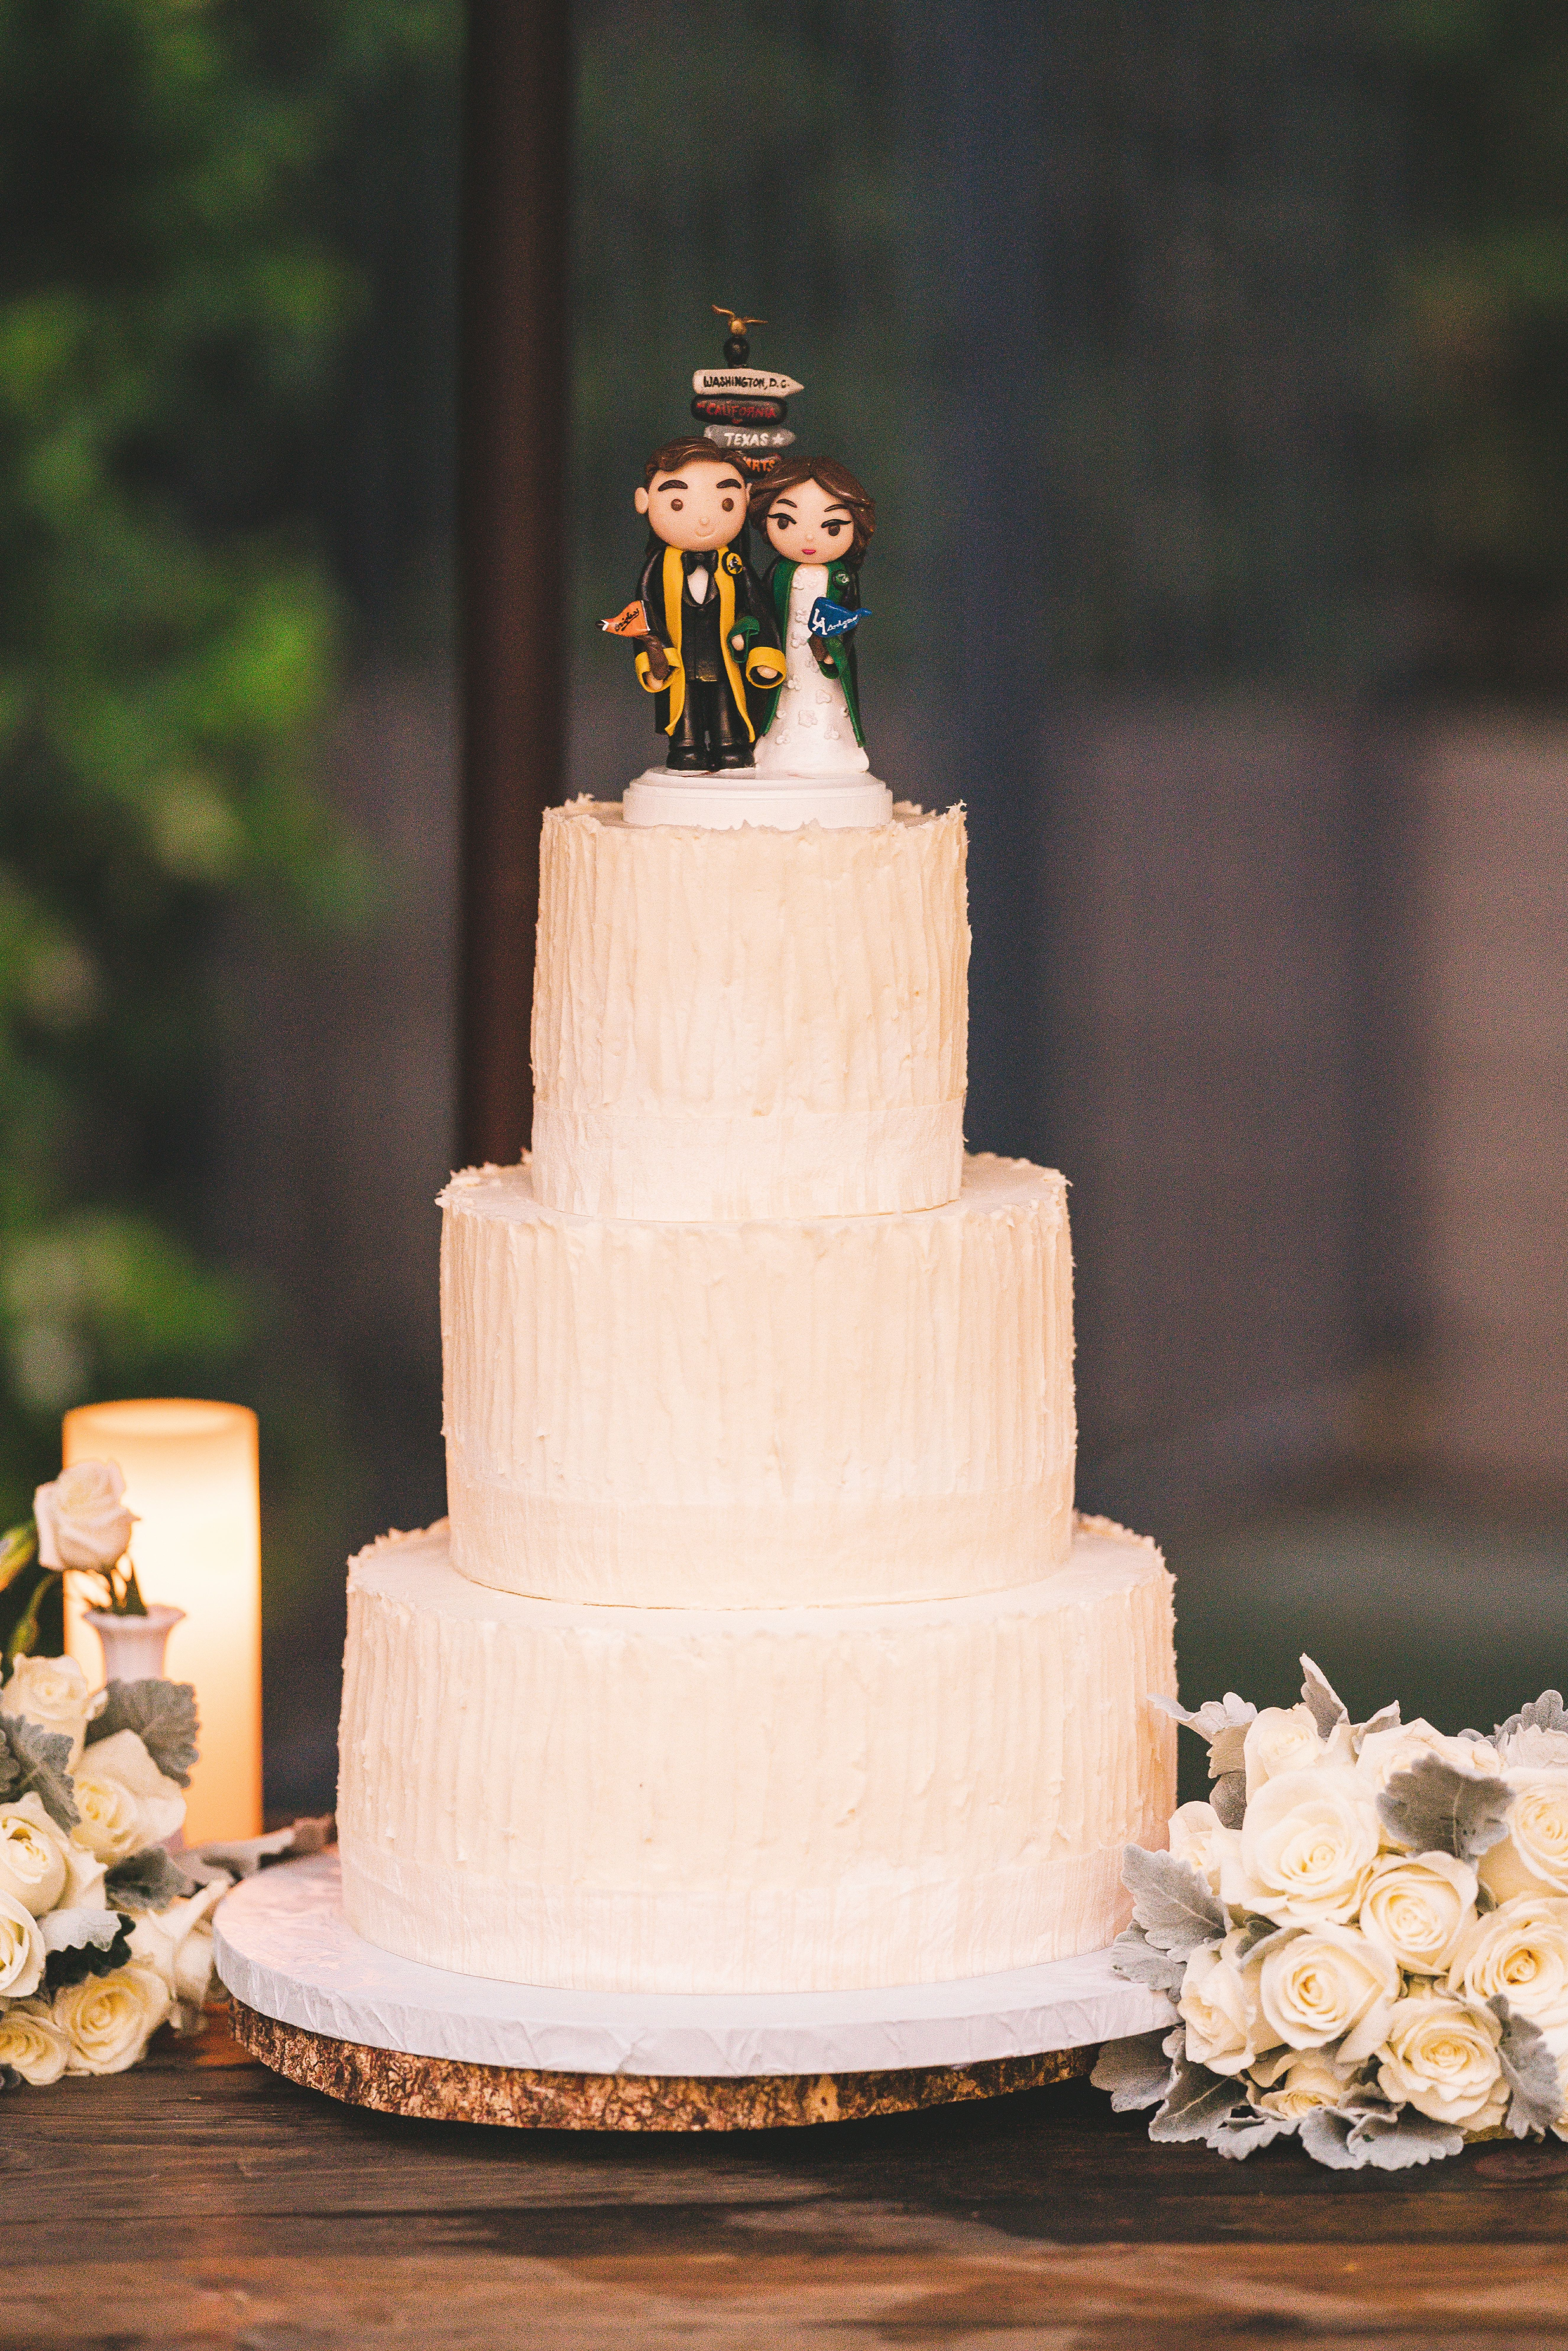 Cake Ideas In 2020 Wedding Cake Decorations Wedding Cake Toppers Wedding Cakes